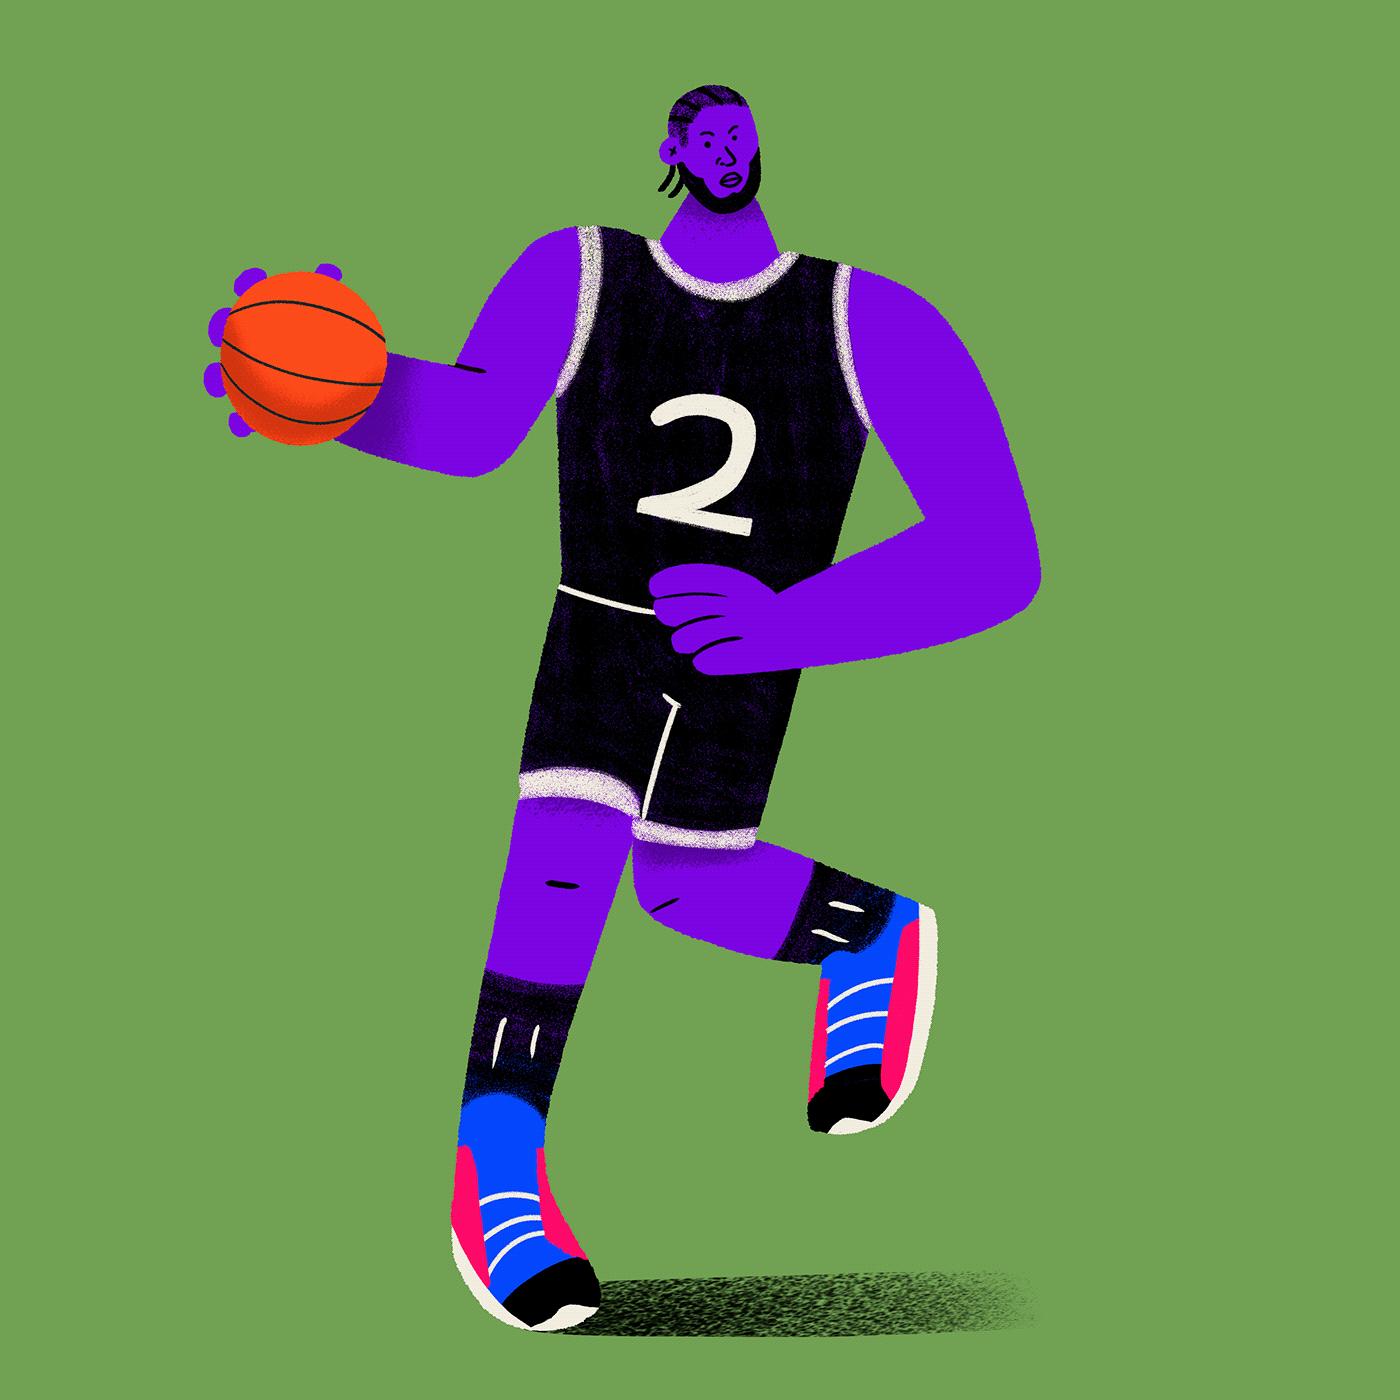 advertasing Character colorful editorial NBA